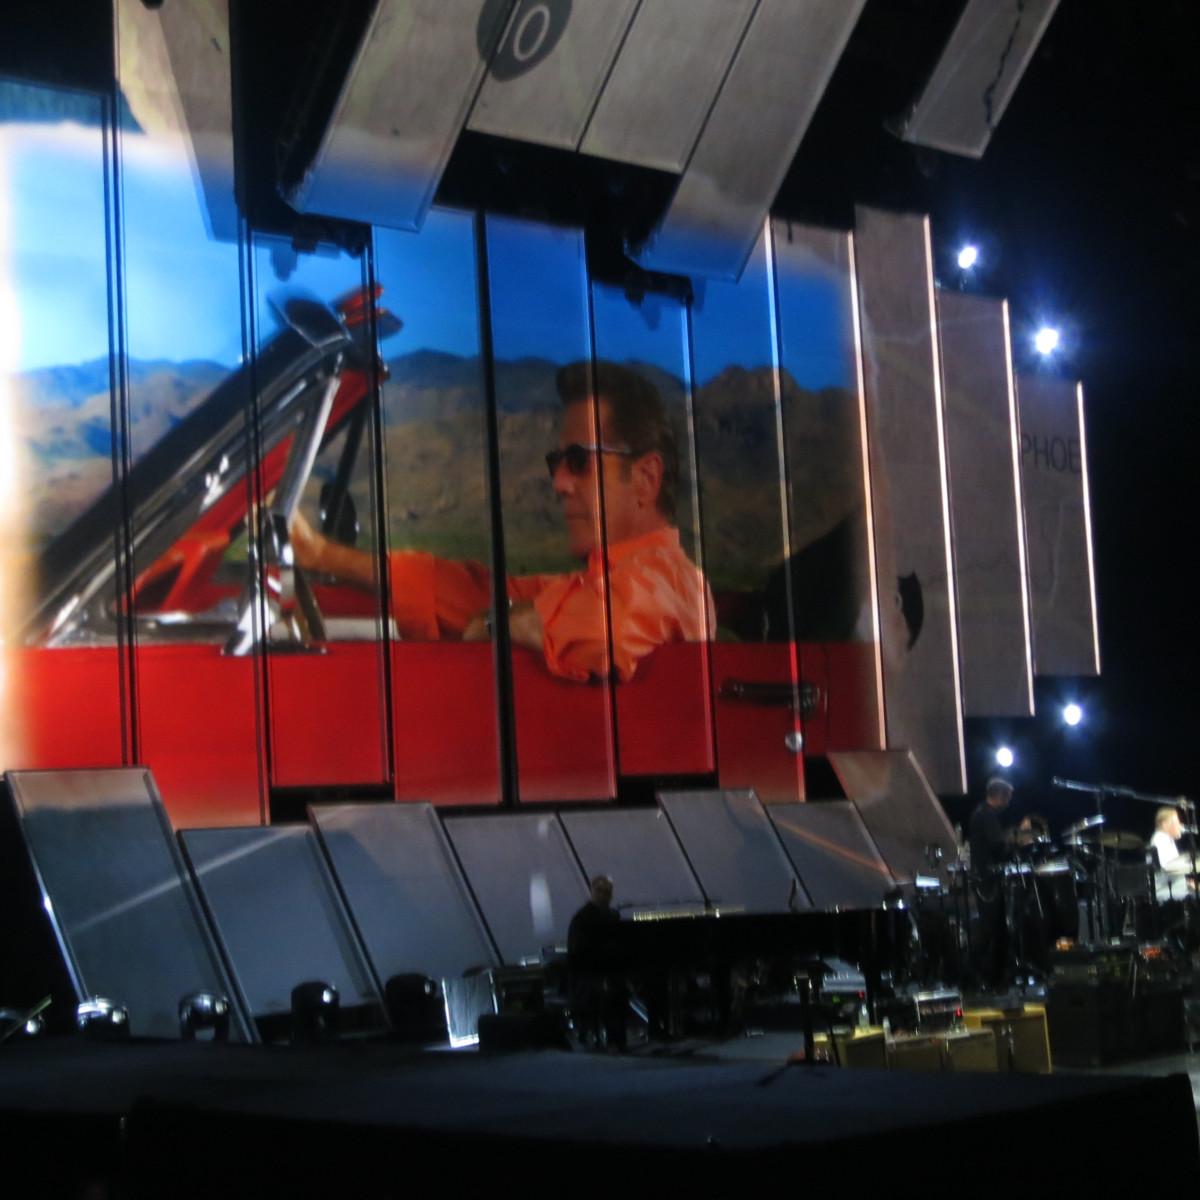 Eagles on stage in Philadelphia July 2013